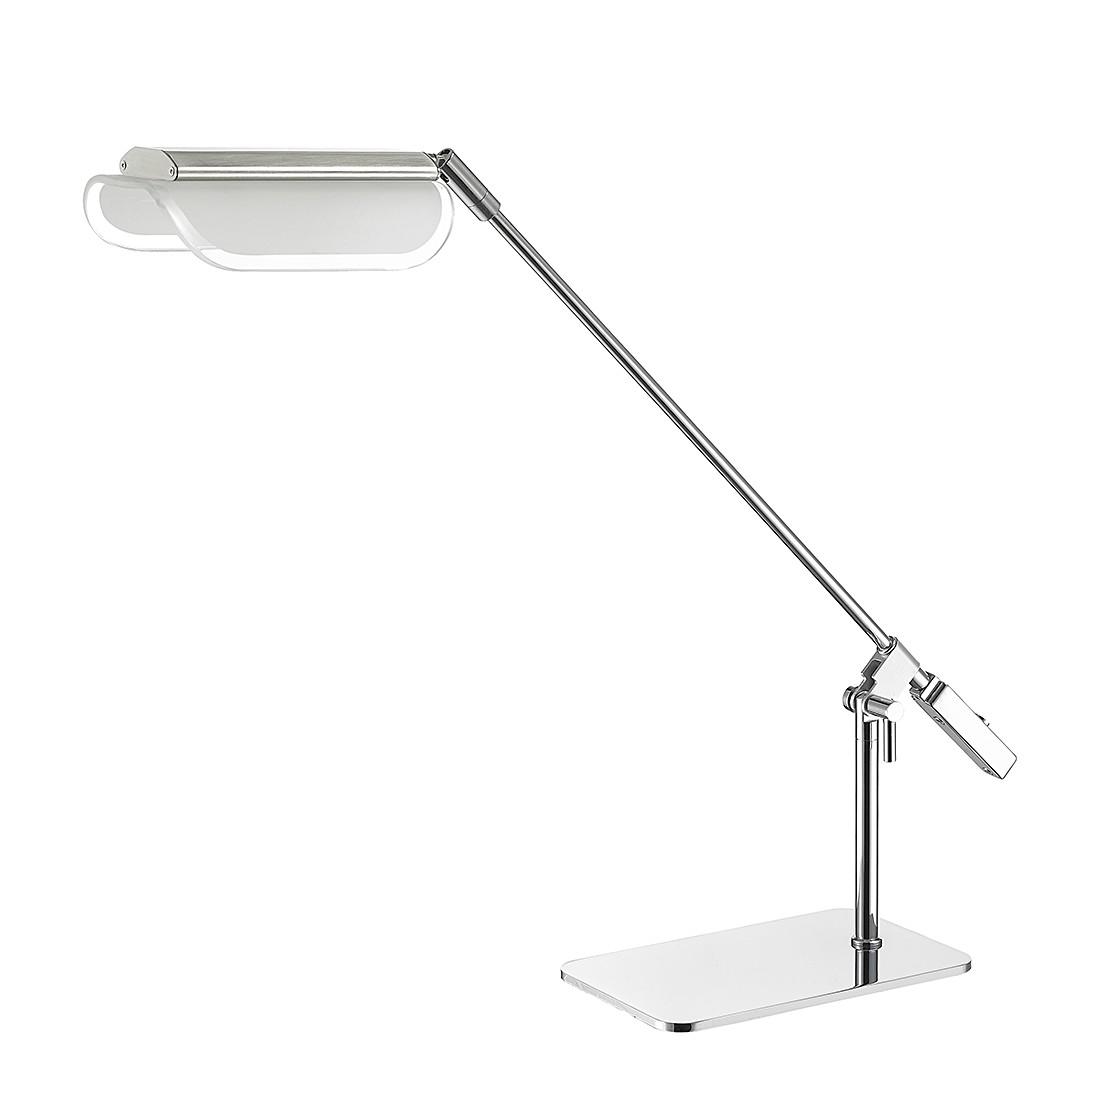 EEK A+, LED Tischleuchte Marina – Metall – 1-flammig, Sorpetaler kaufen